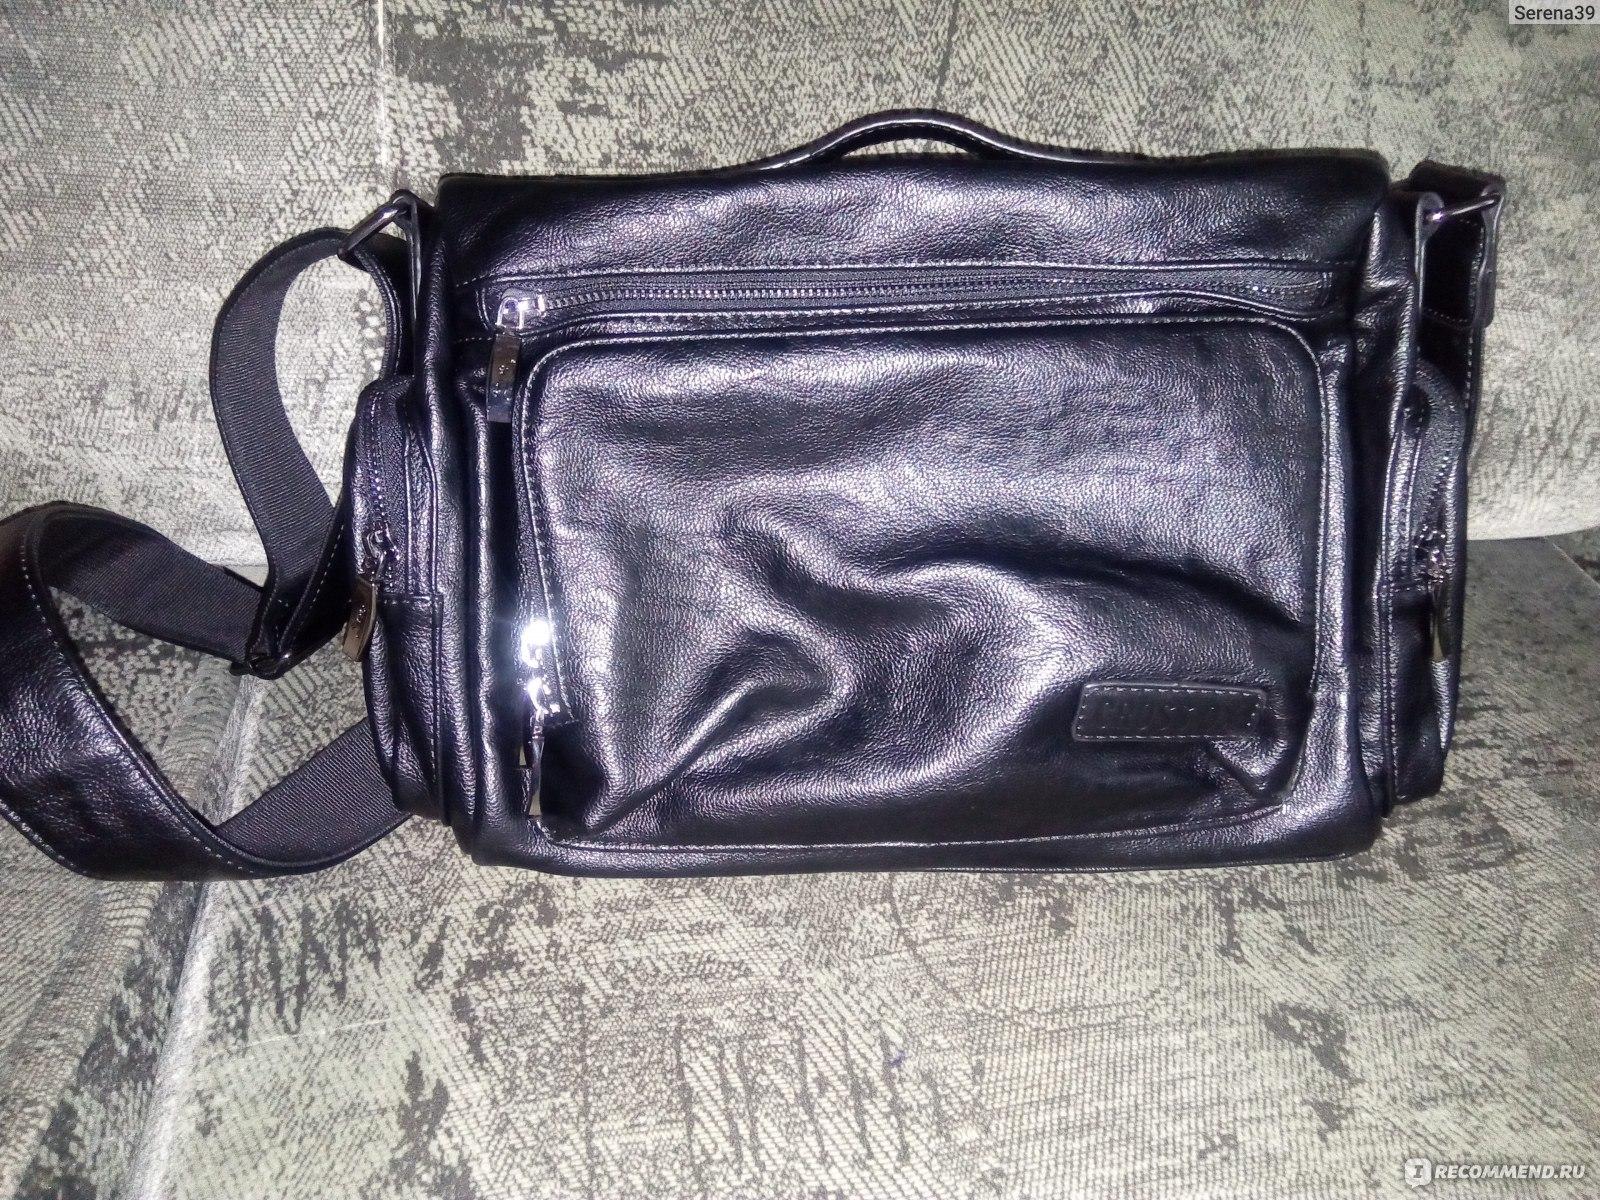 0692e50333c7 Сумка мужская Aliexpress CROSS OX New Arrival Messenger Bags For Men  Shoulder Bag Business Casual male